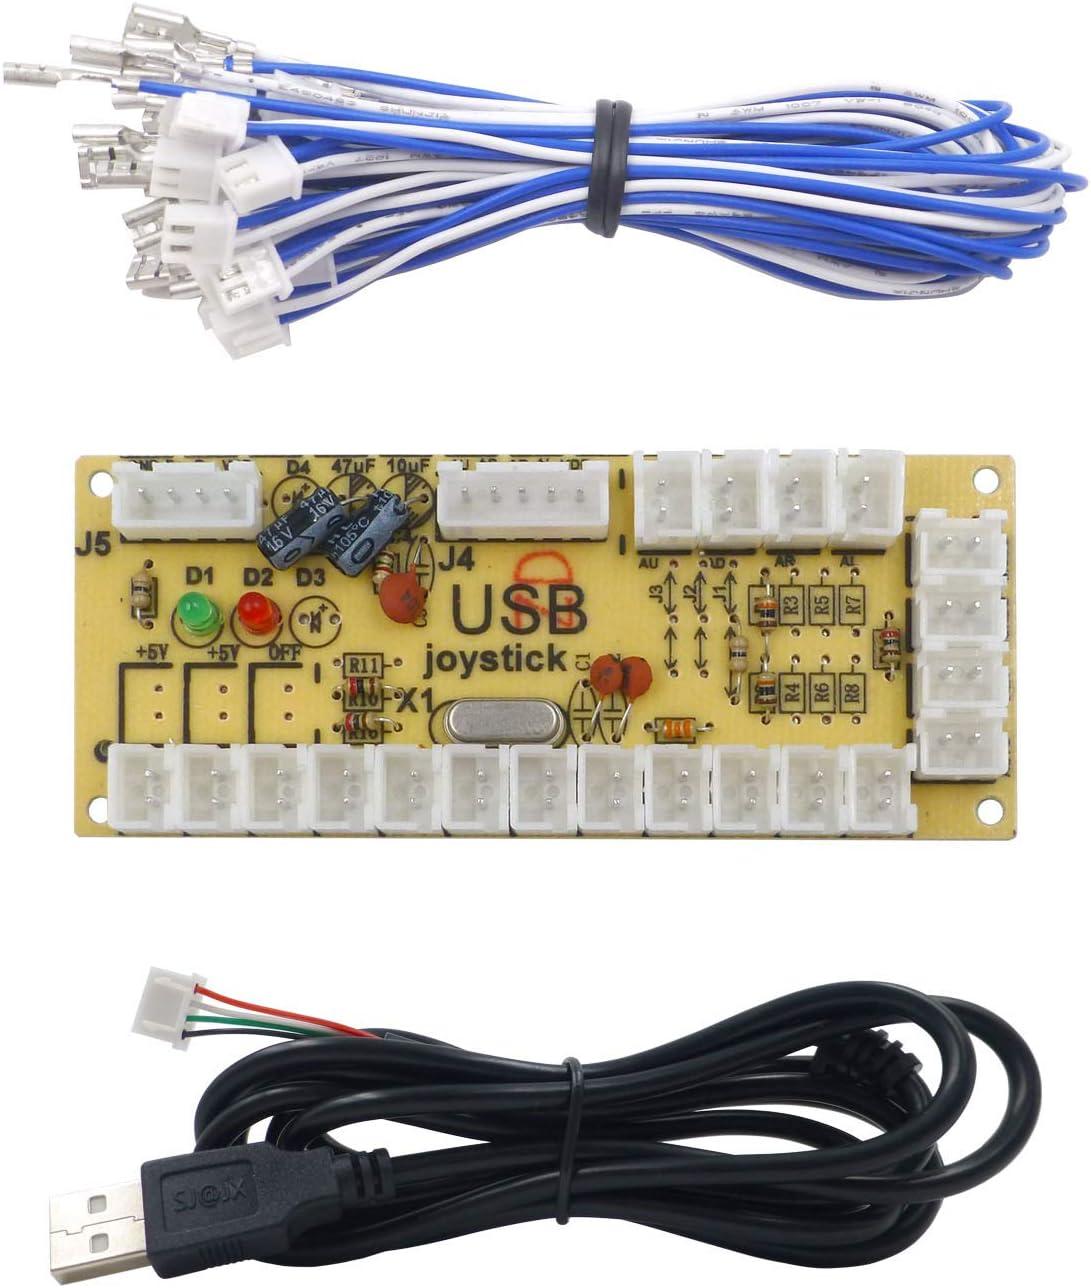 SJ@JX Arcade USB Encoder Fight Stick Raspberry Pi Joystick Button PC MAME Retro Pie Zero Delay USB 5V Encoder Board